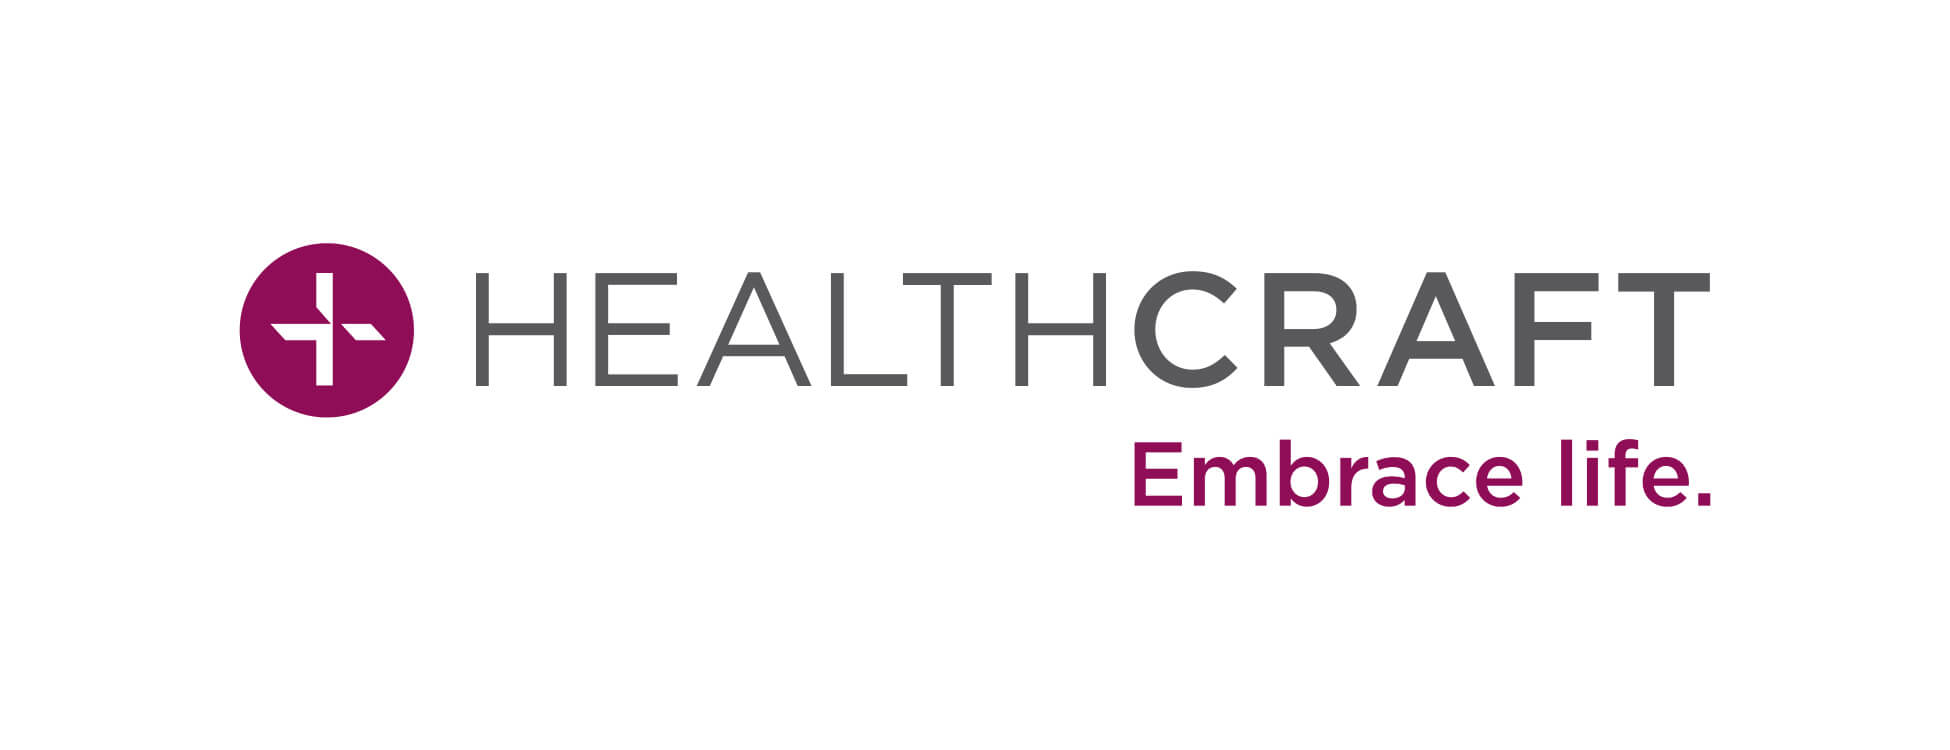 Healthcraft products- Grab bars, Super Pole grab bars, PT rail grab bar